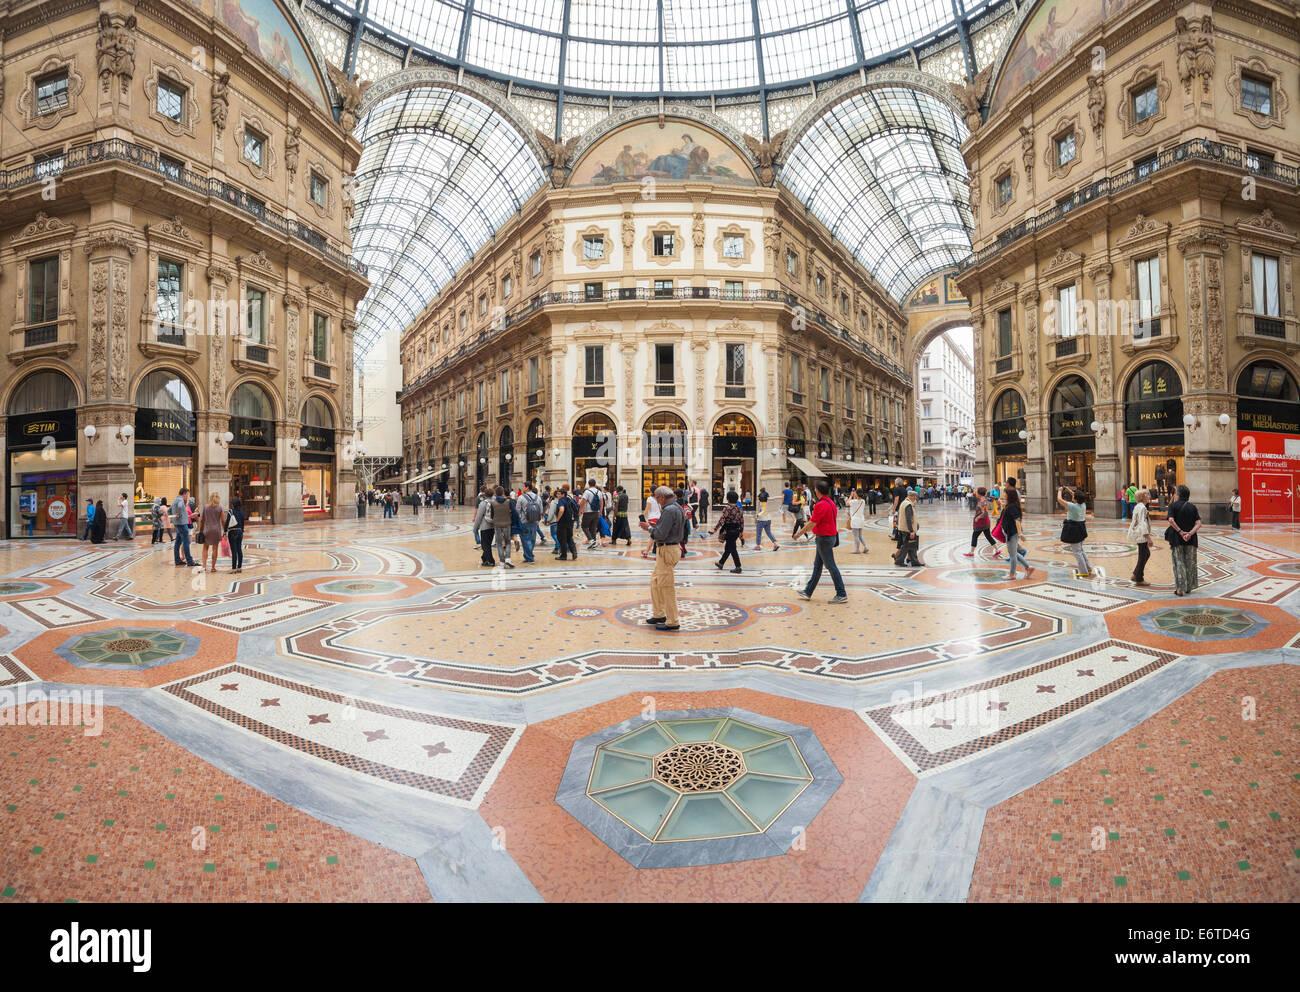 Vittorio Emanuele Gallery La Galleria Milan Milano Italy Stock Photo Alamy